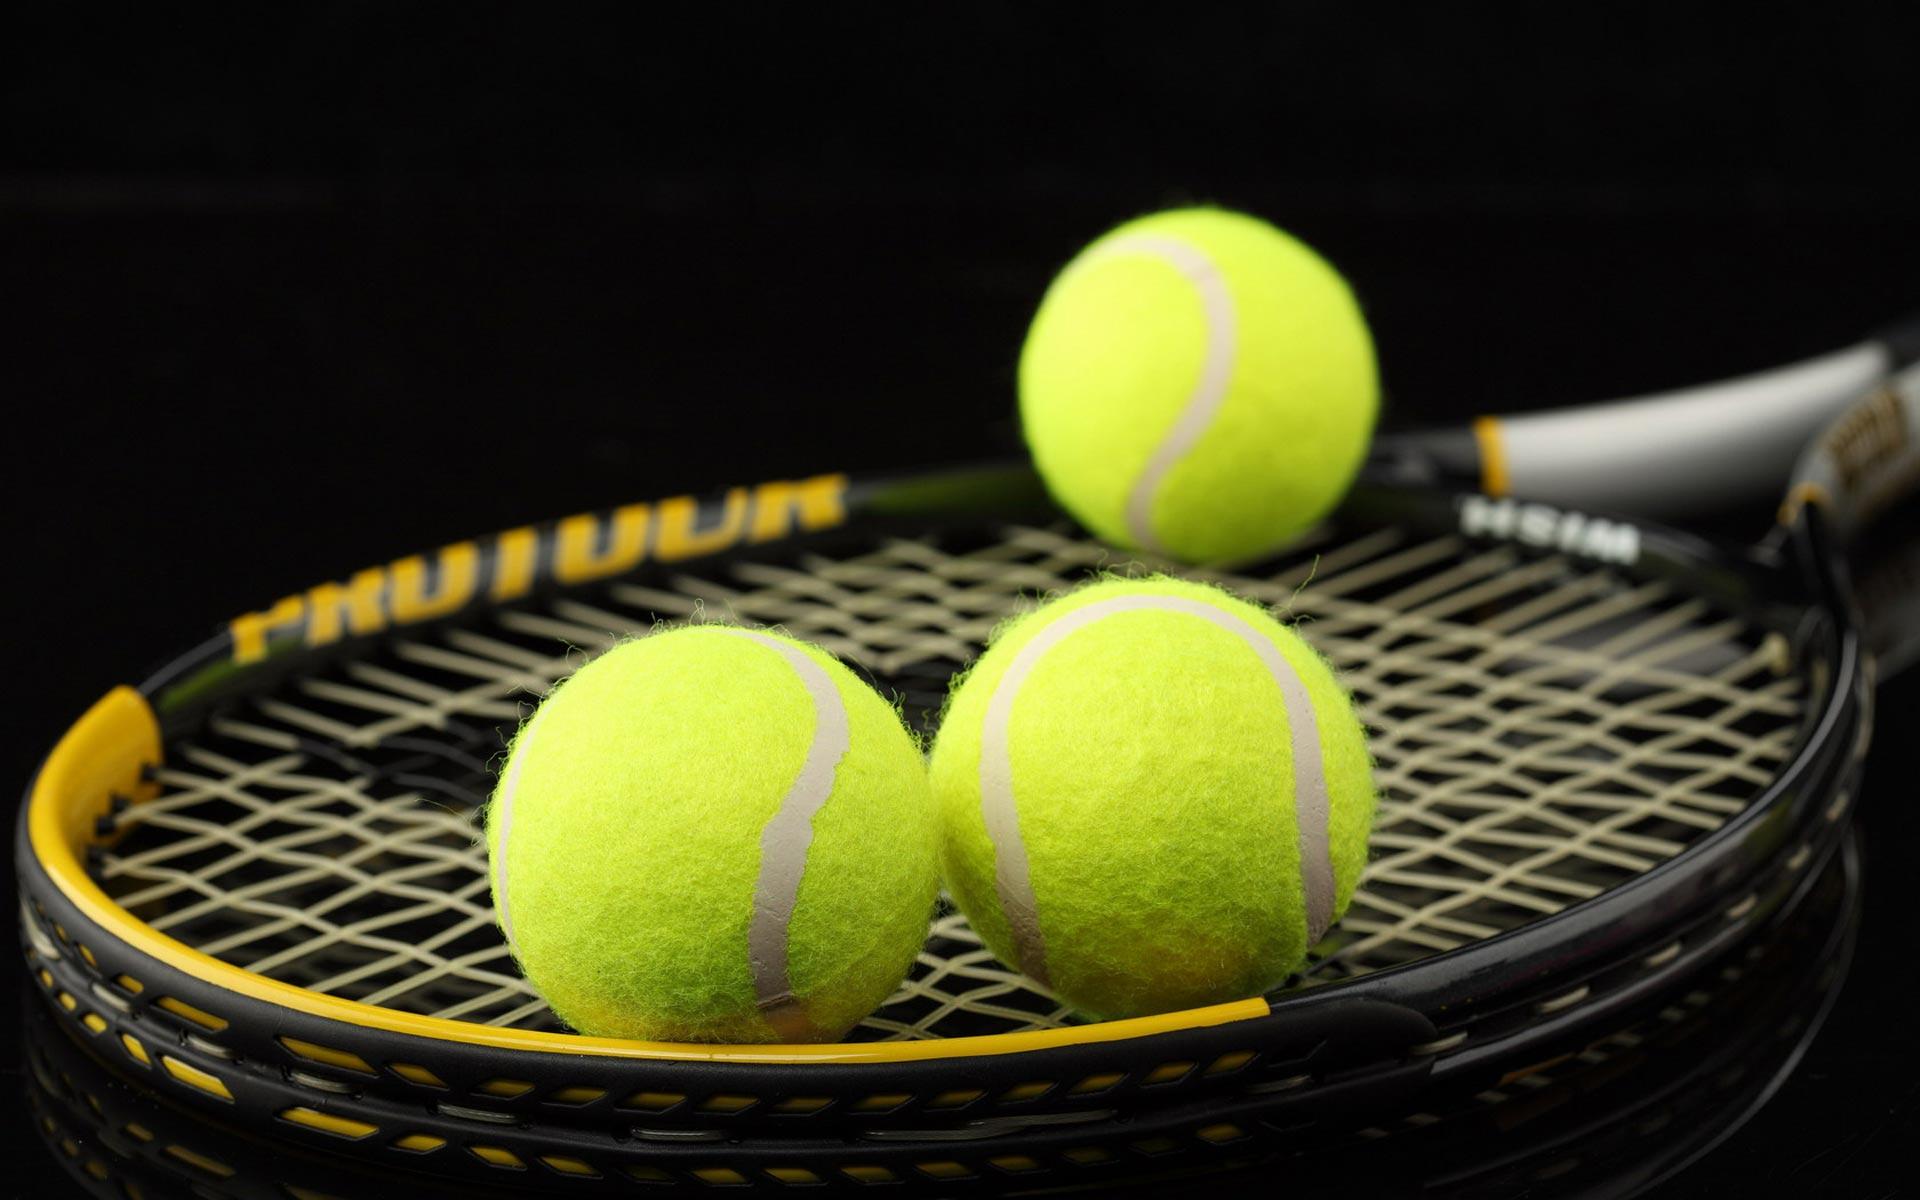 Cavan Lawn Tennis Club 1920x1200